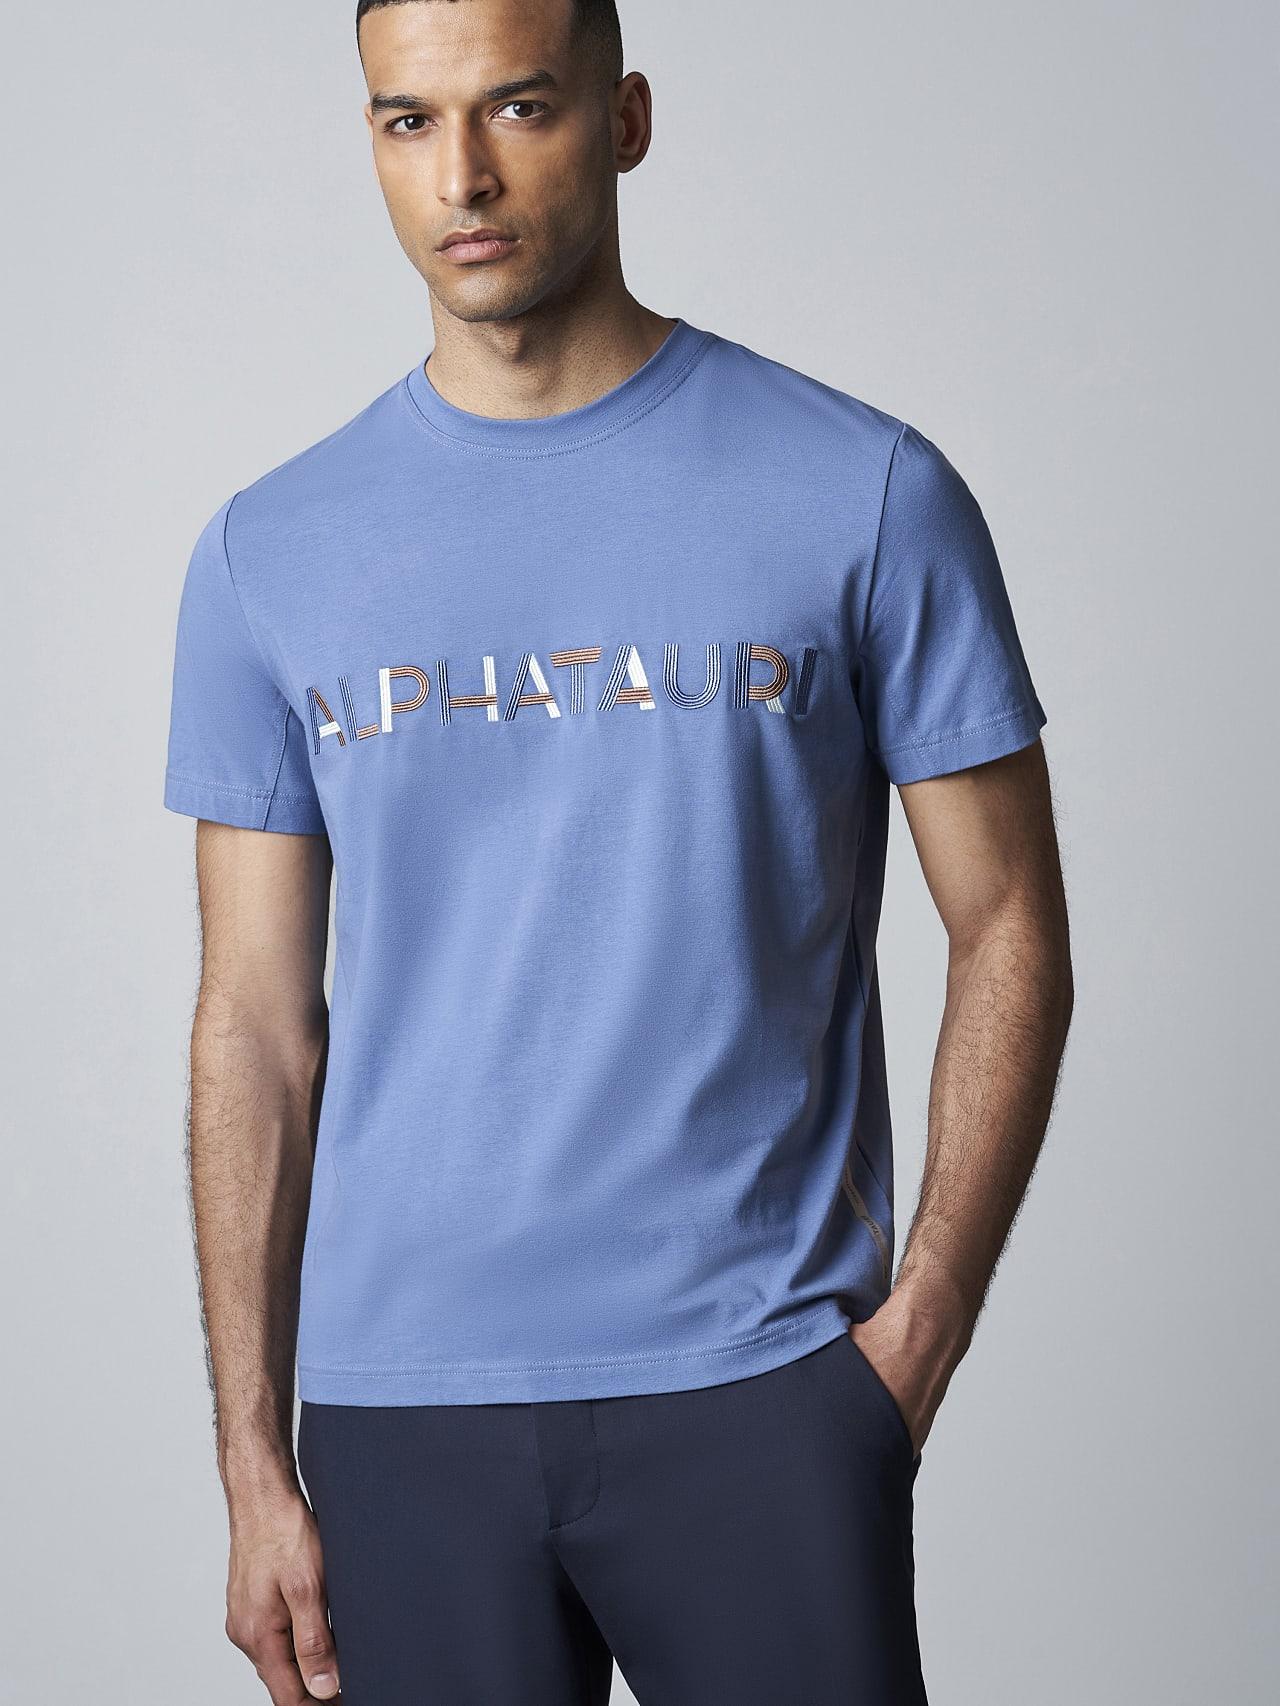 JANOS V3.Y5.02 Logo Embroidery T-Shirt light blue Front Main Alpha Tauri